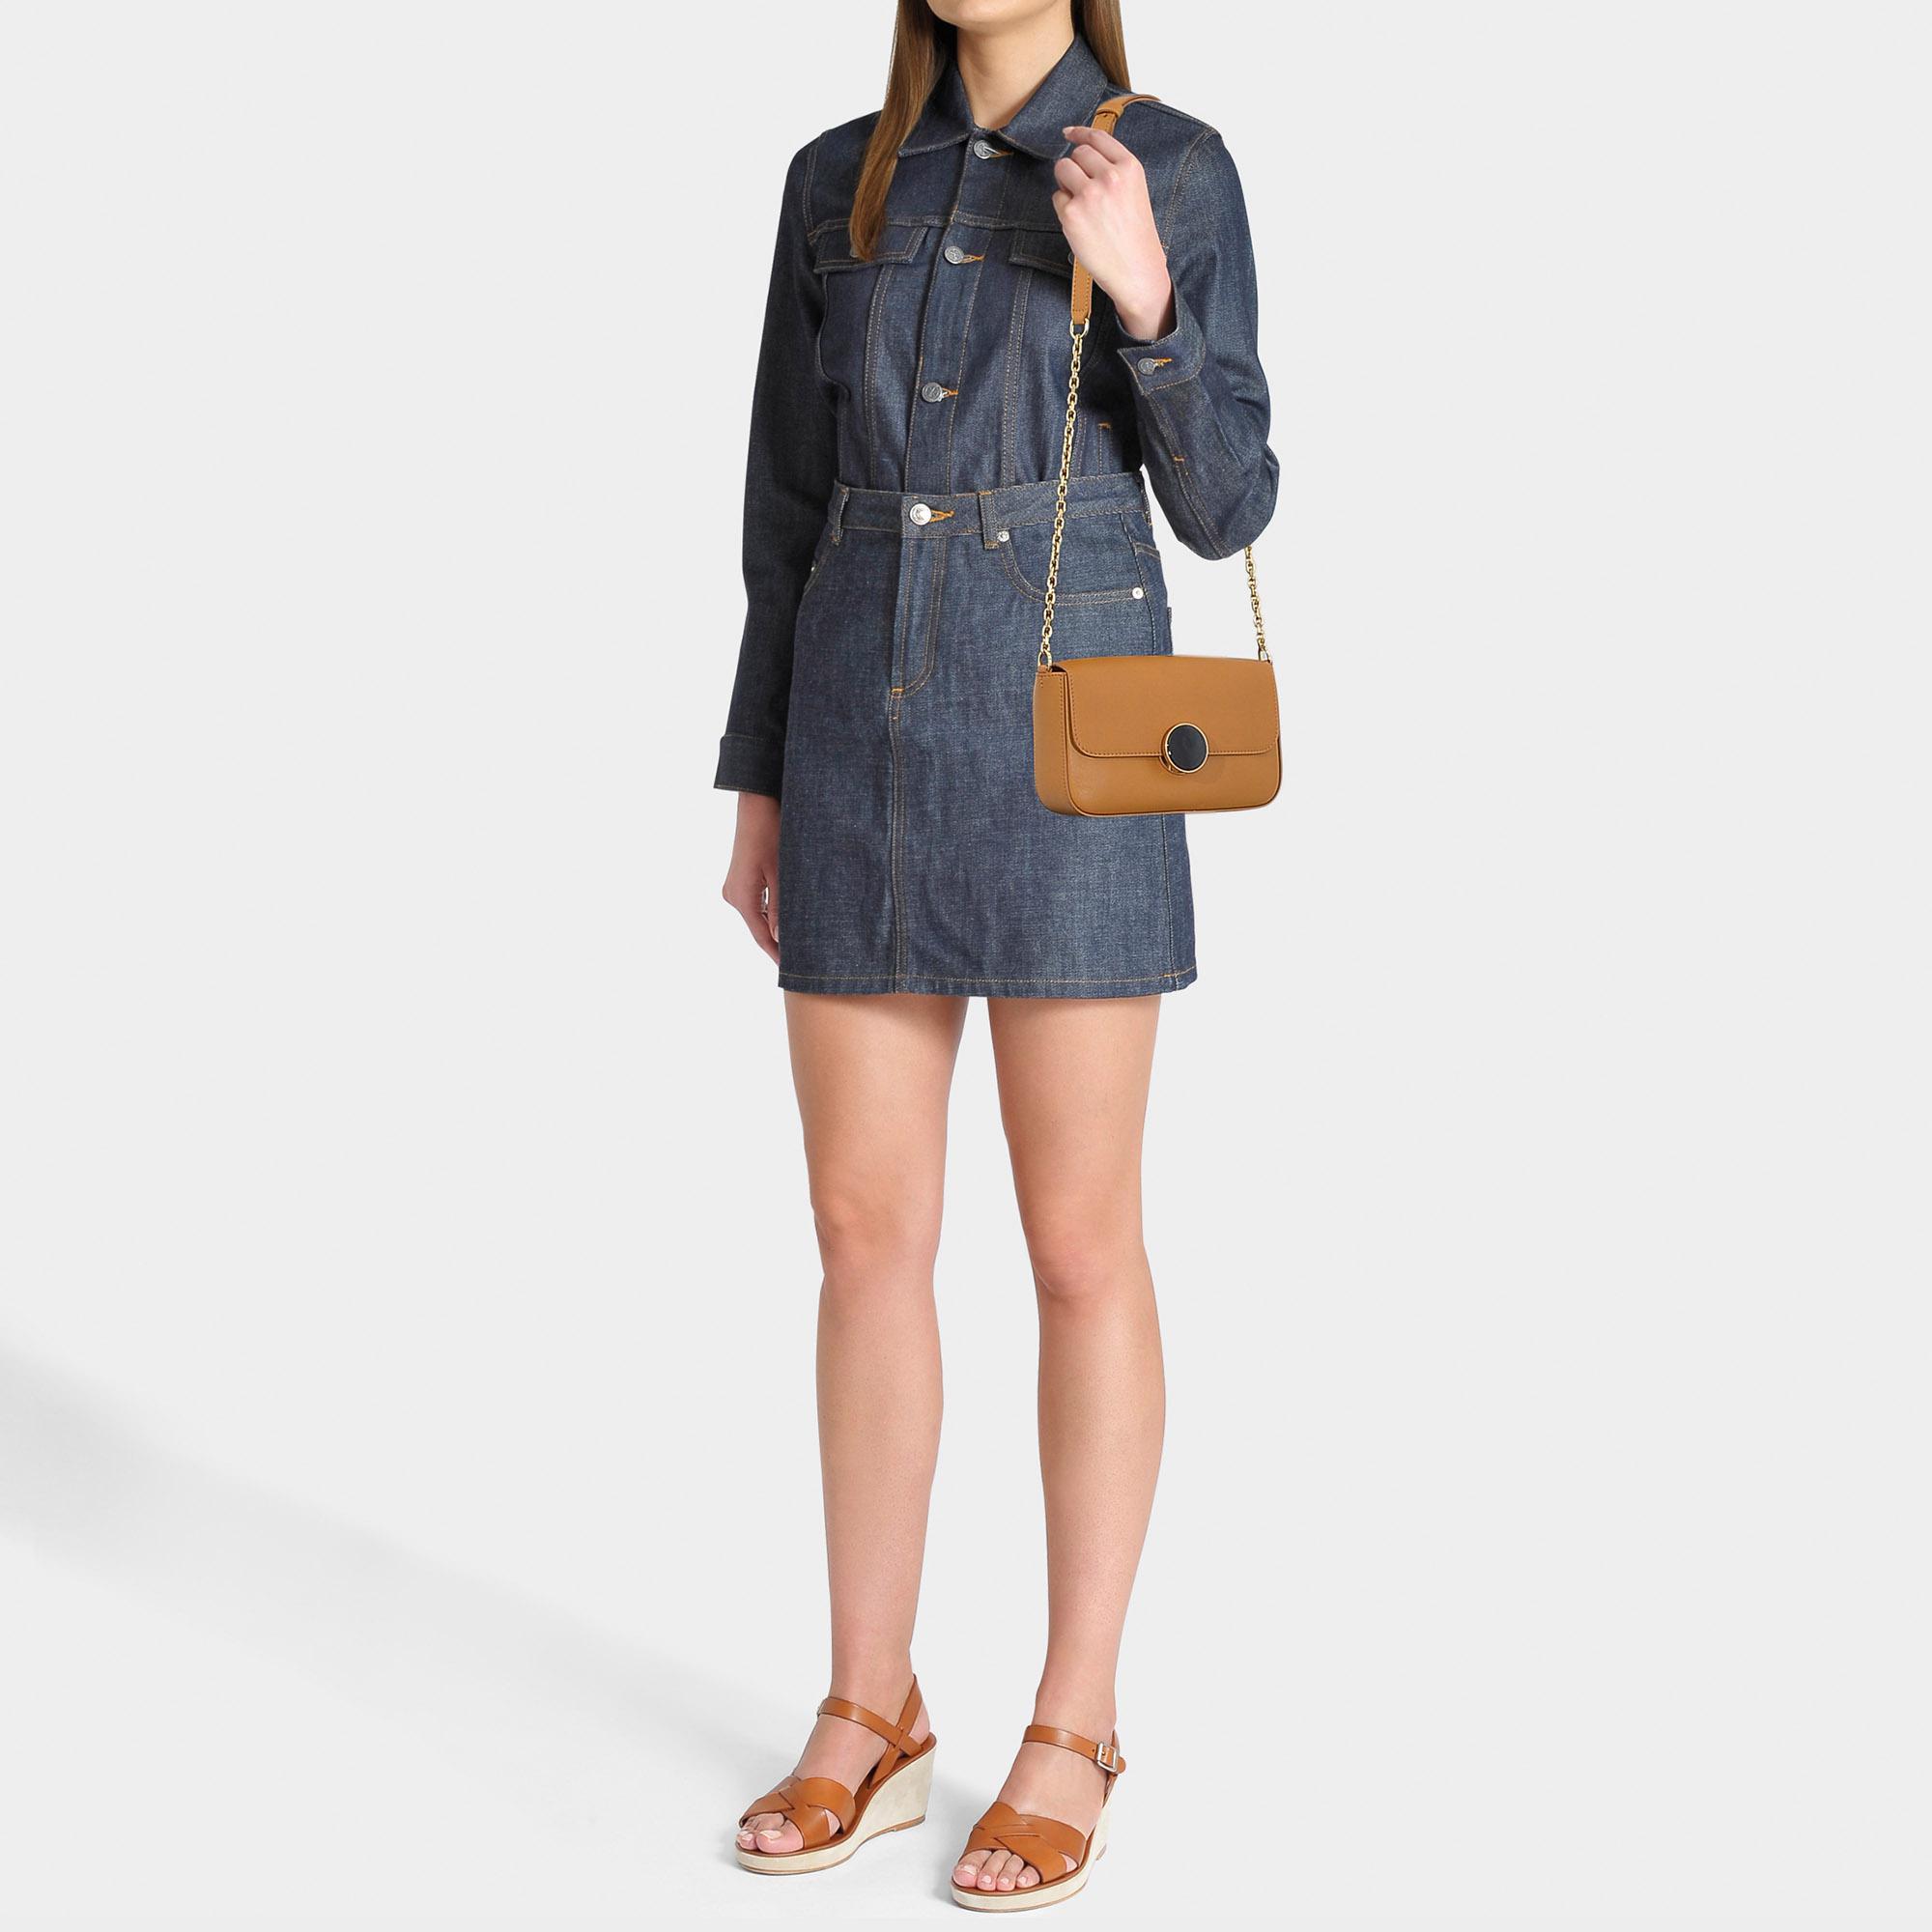 f6a218708a4c vanessa-bruno-Yellow-Moon-Rigide-Crossbody-Bag-In-Honey-Leather.jpeg